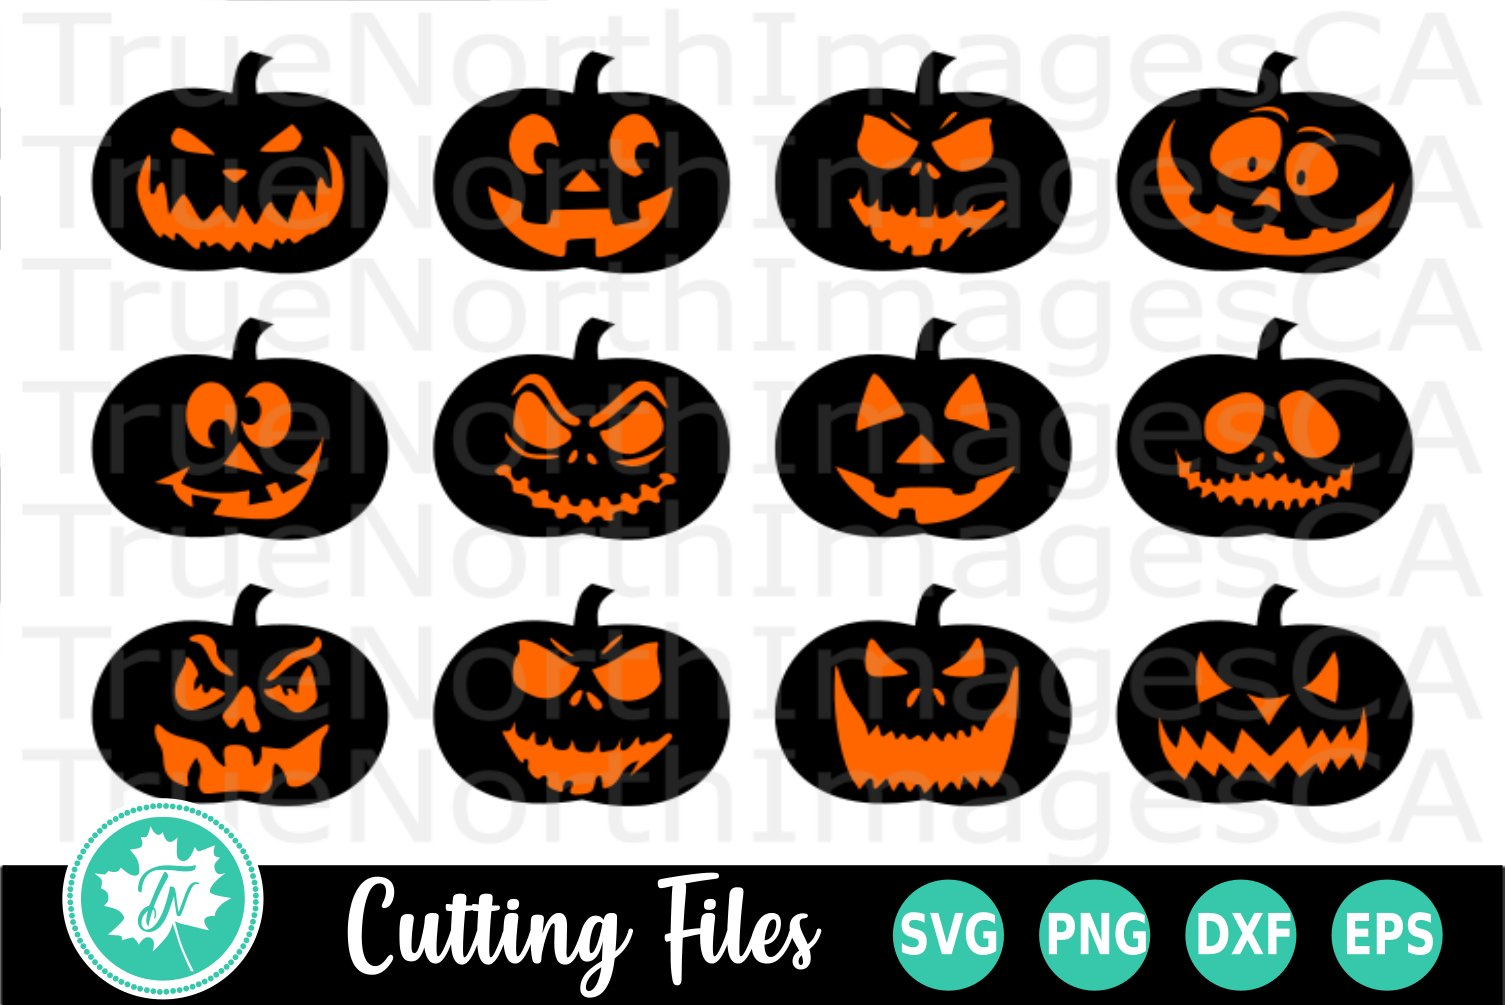 Halloween Svg Pumpkin Svg Jack O Lantern Svg 206800 Cut Files Design Bundles